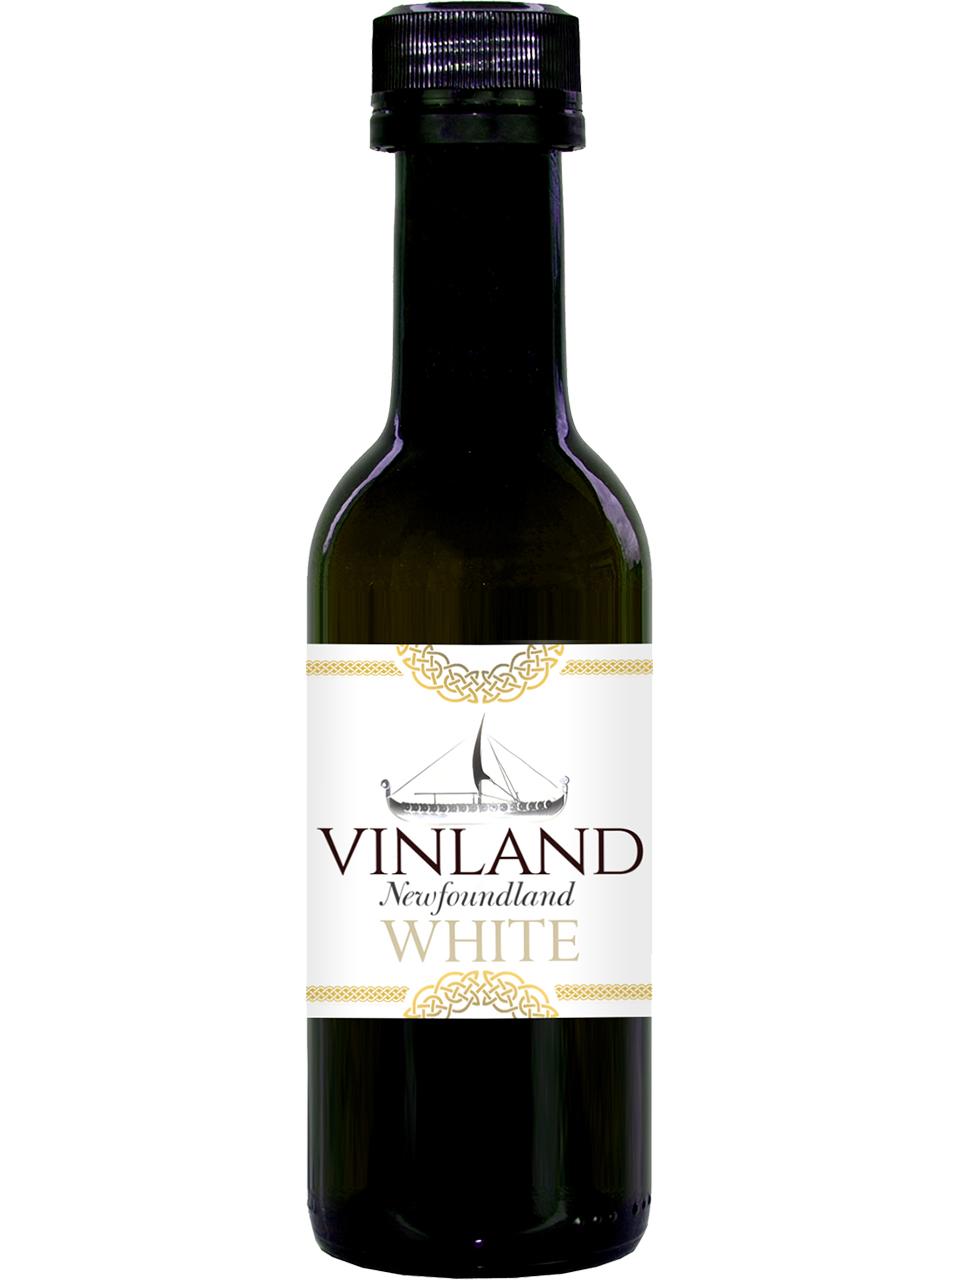 Vinland White